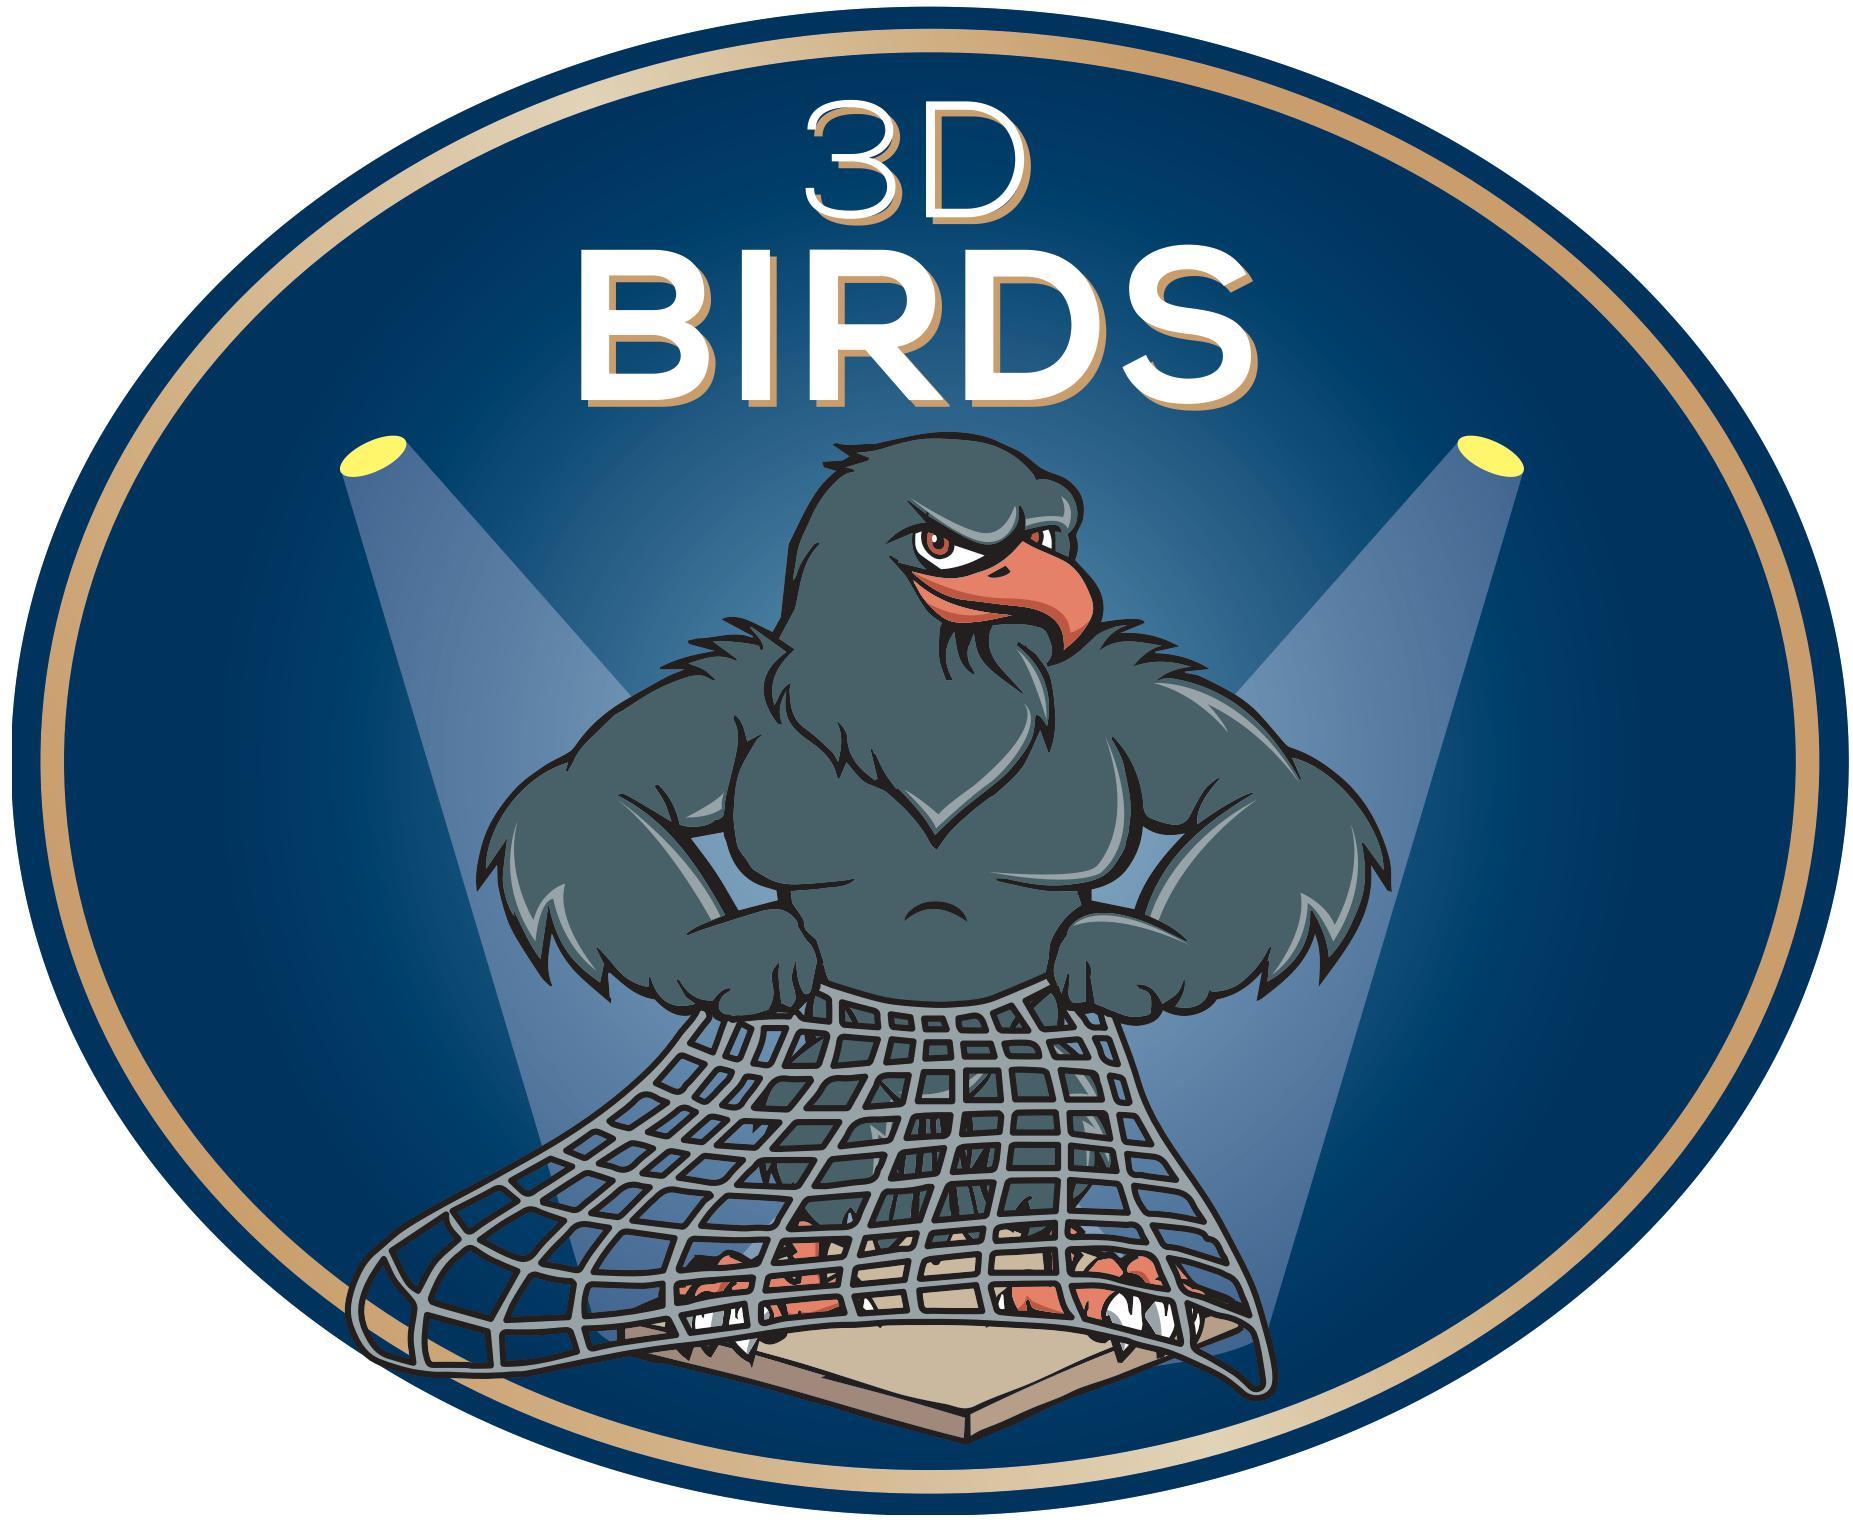 LOGO 3D BIRDS JPEG.jpg